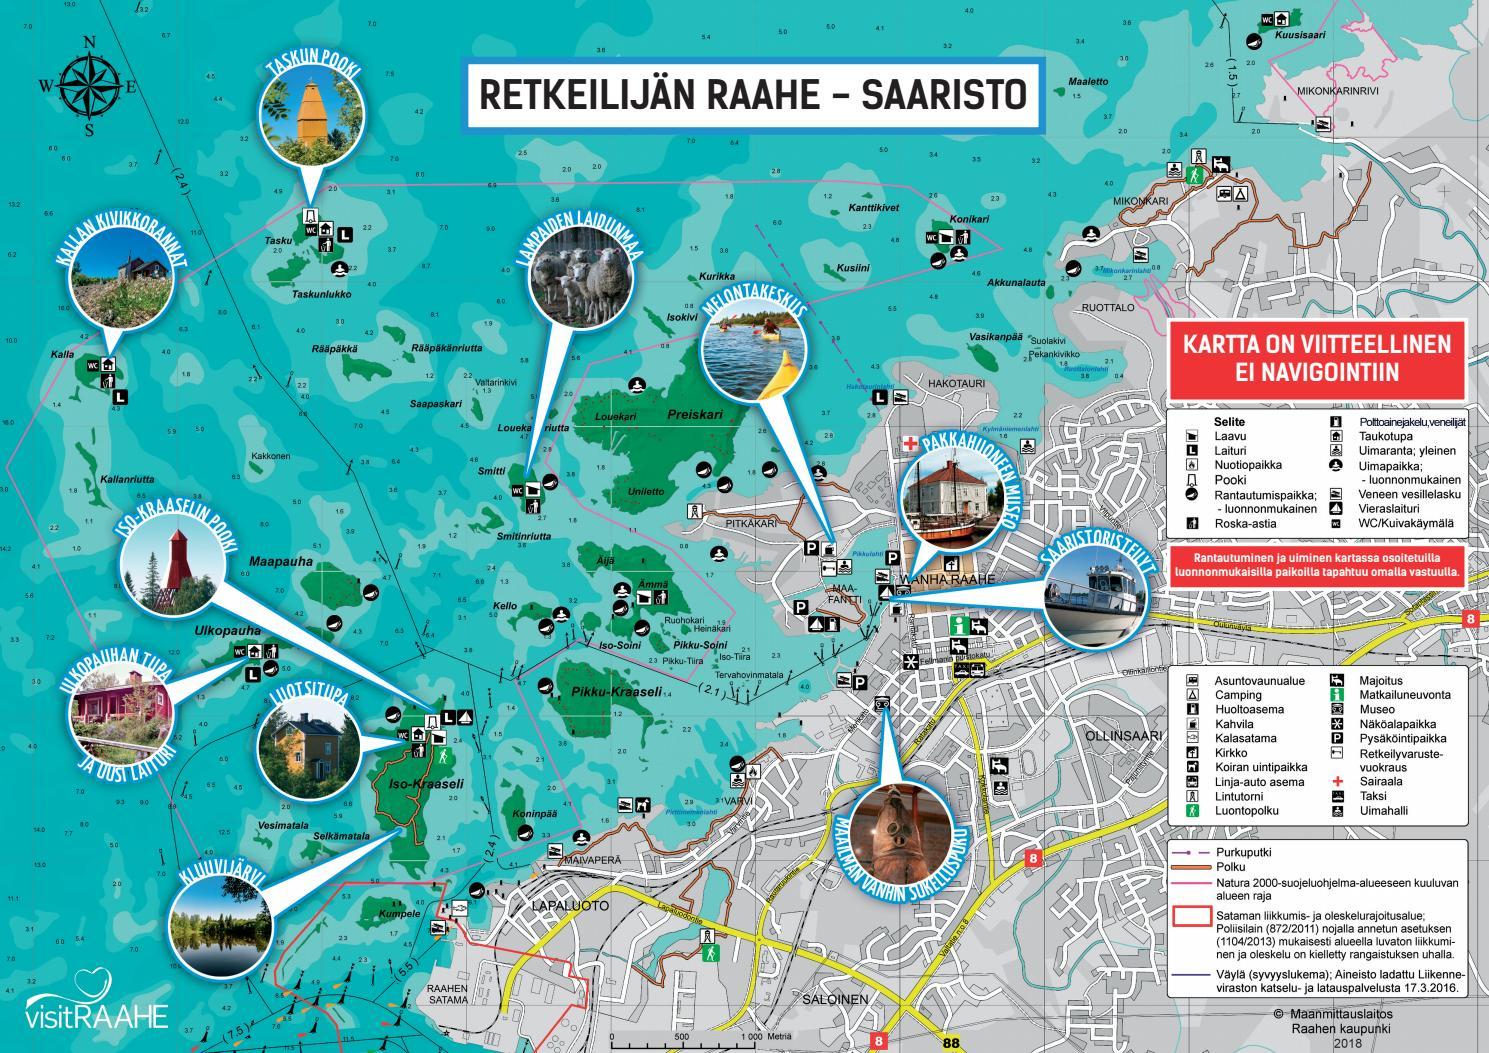 Retkelijan Raahe Raahen Saariston Kartta 2018 By Raahen Kaupunki